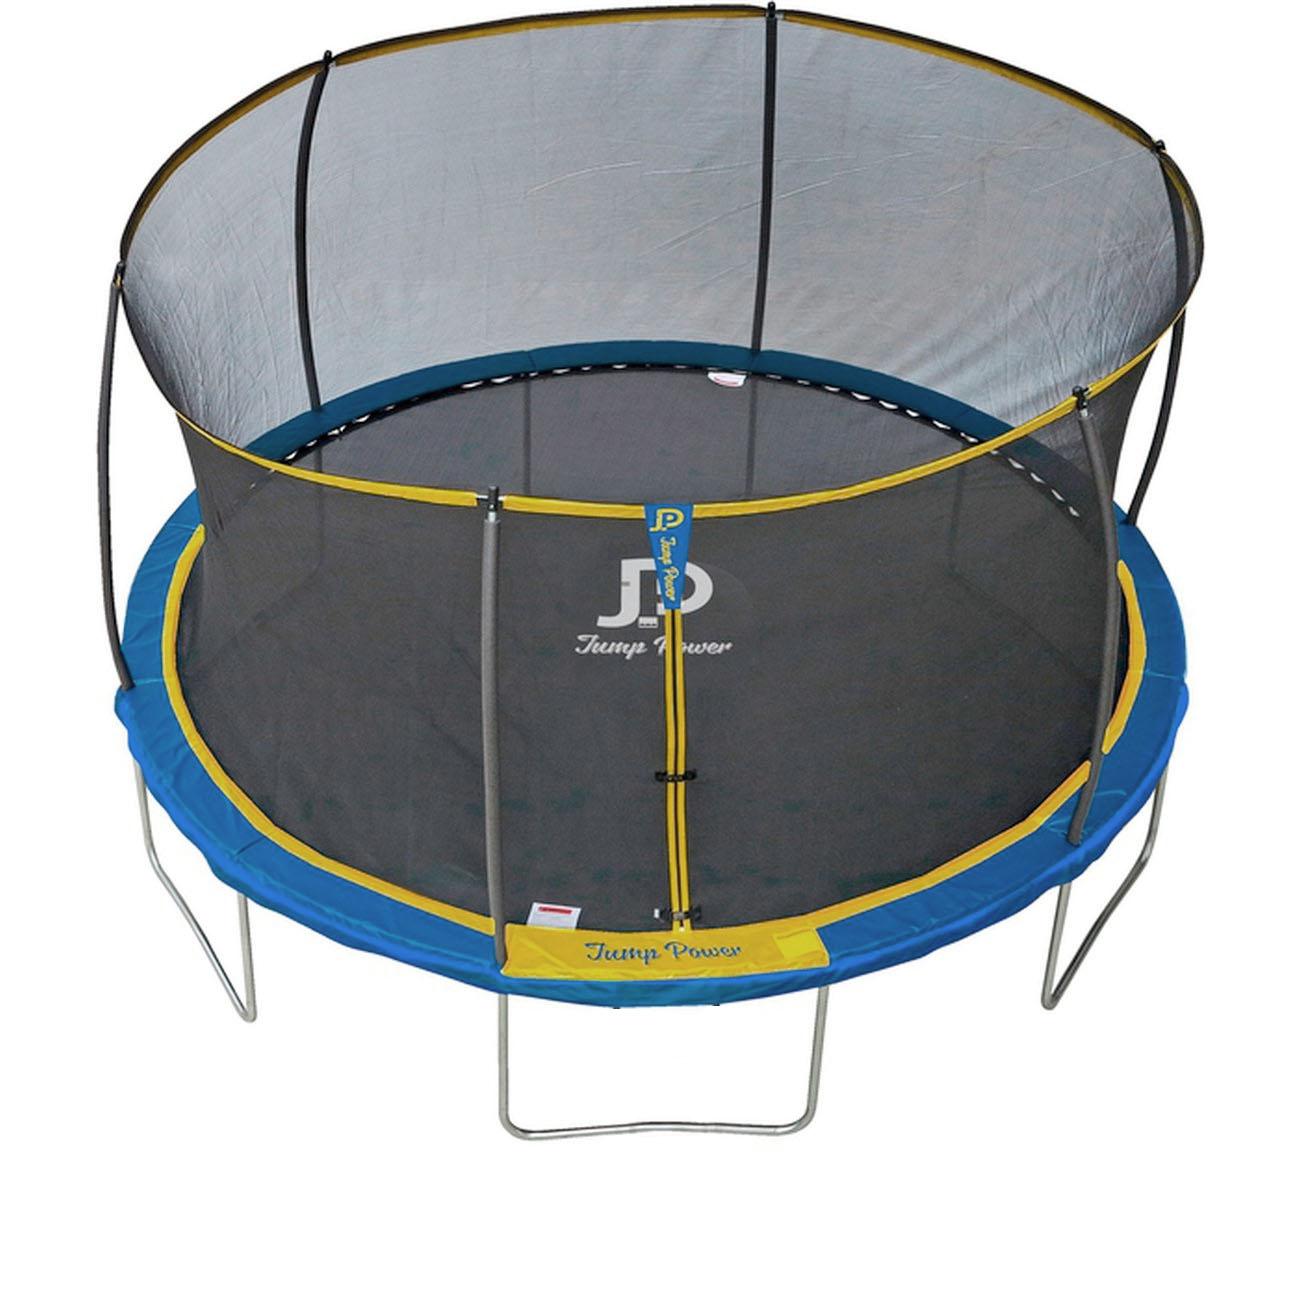 Tappeto elastico JP Prince modello diametro 366 cm